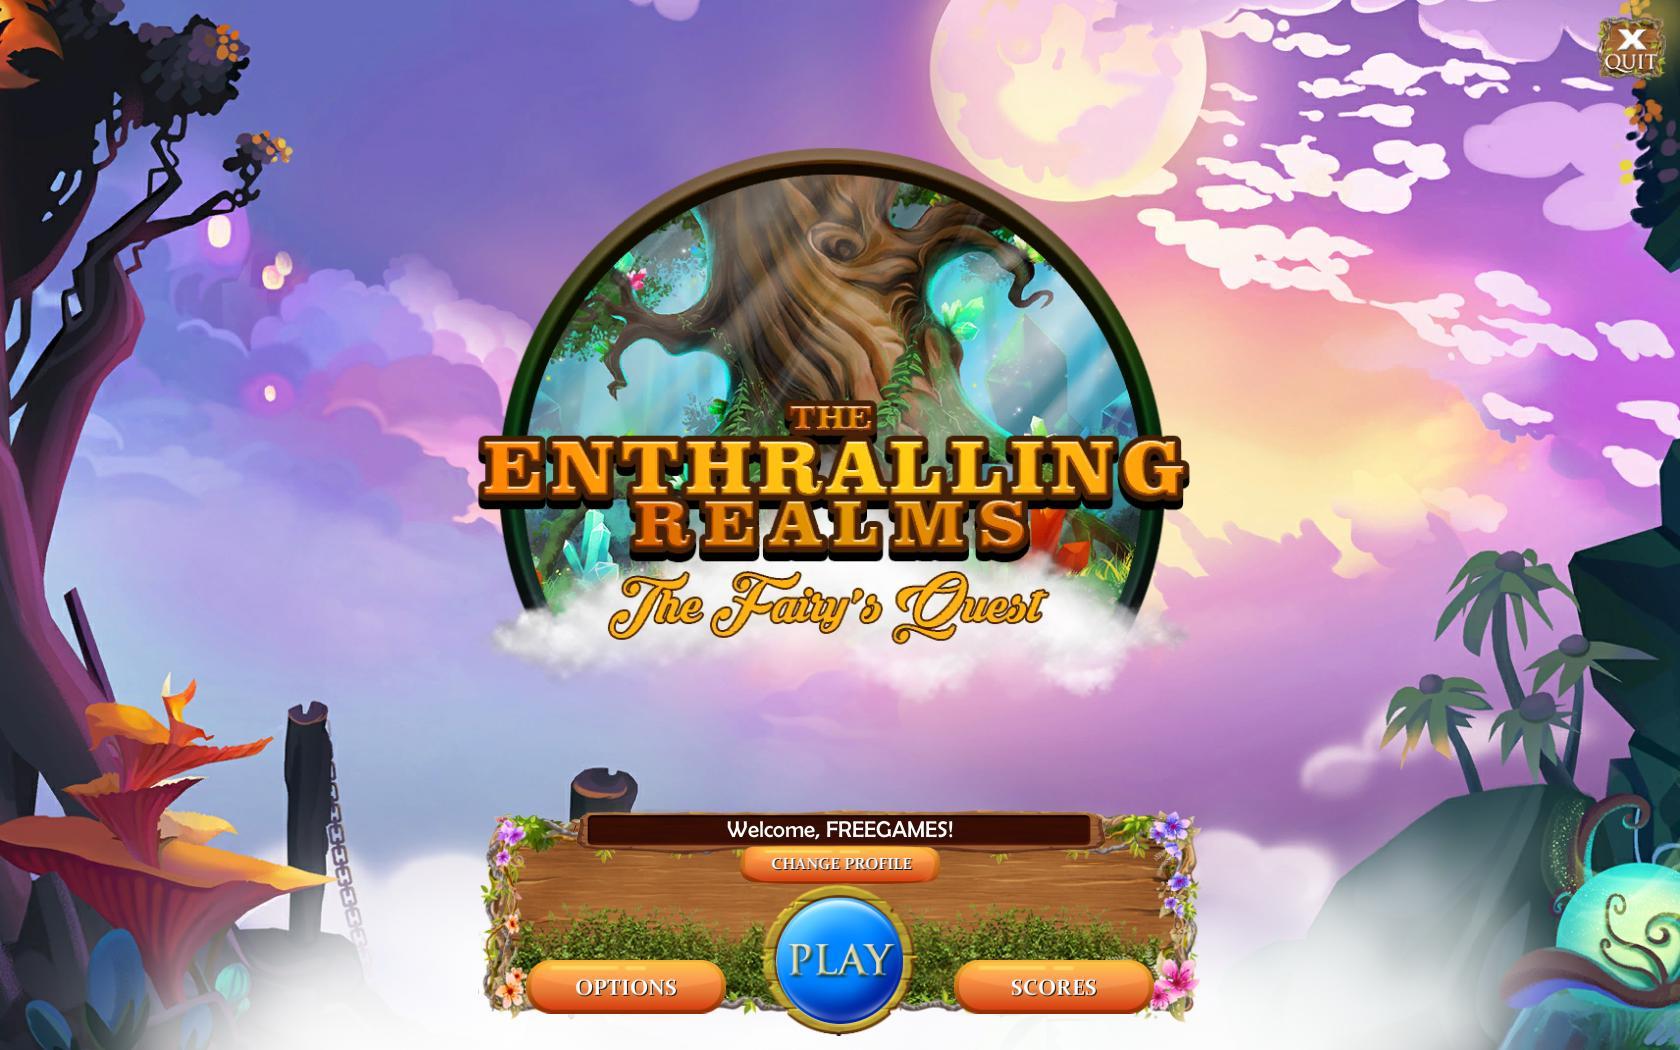 Захваченные Королевства 5: Квест Феи | The Enthralling Realms 5. The Fairy's Quest (En)